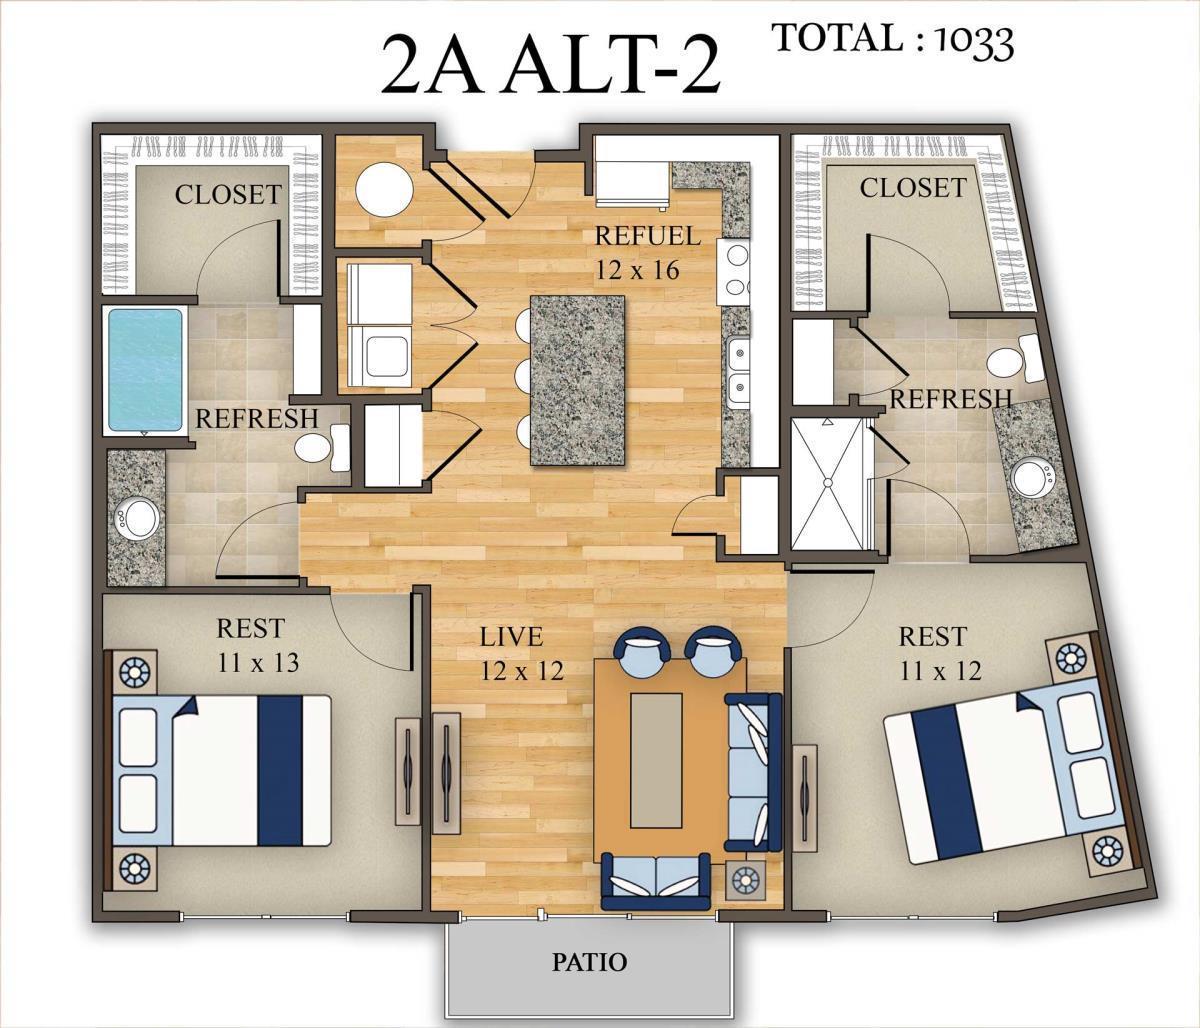 1,033 sq. ft. 2A Alt 2 floor plan